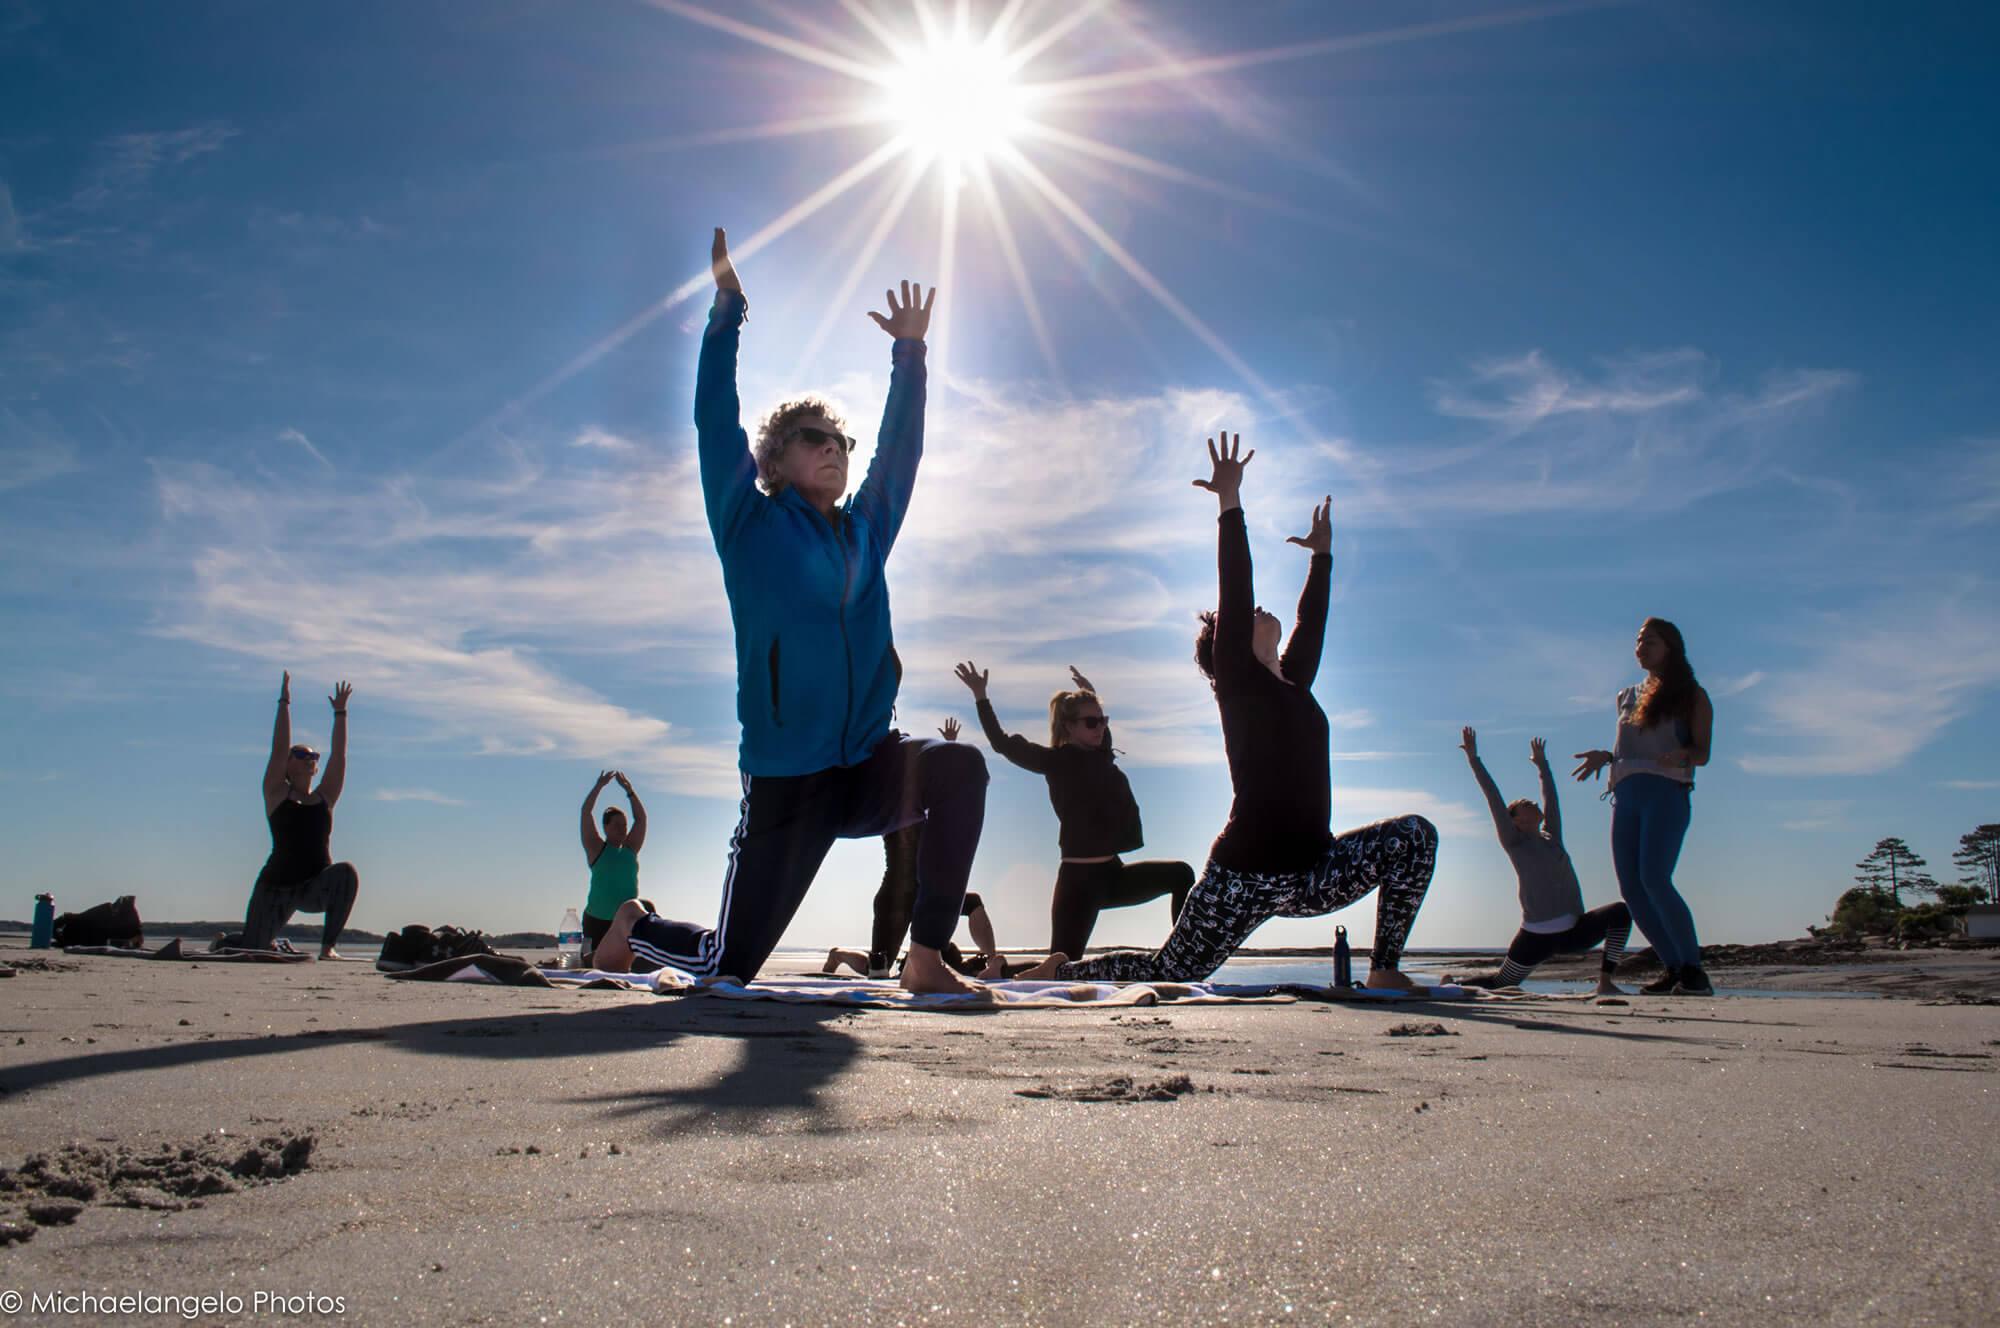 maine-yoga-retreats-yoga-20180616-DSC_9182